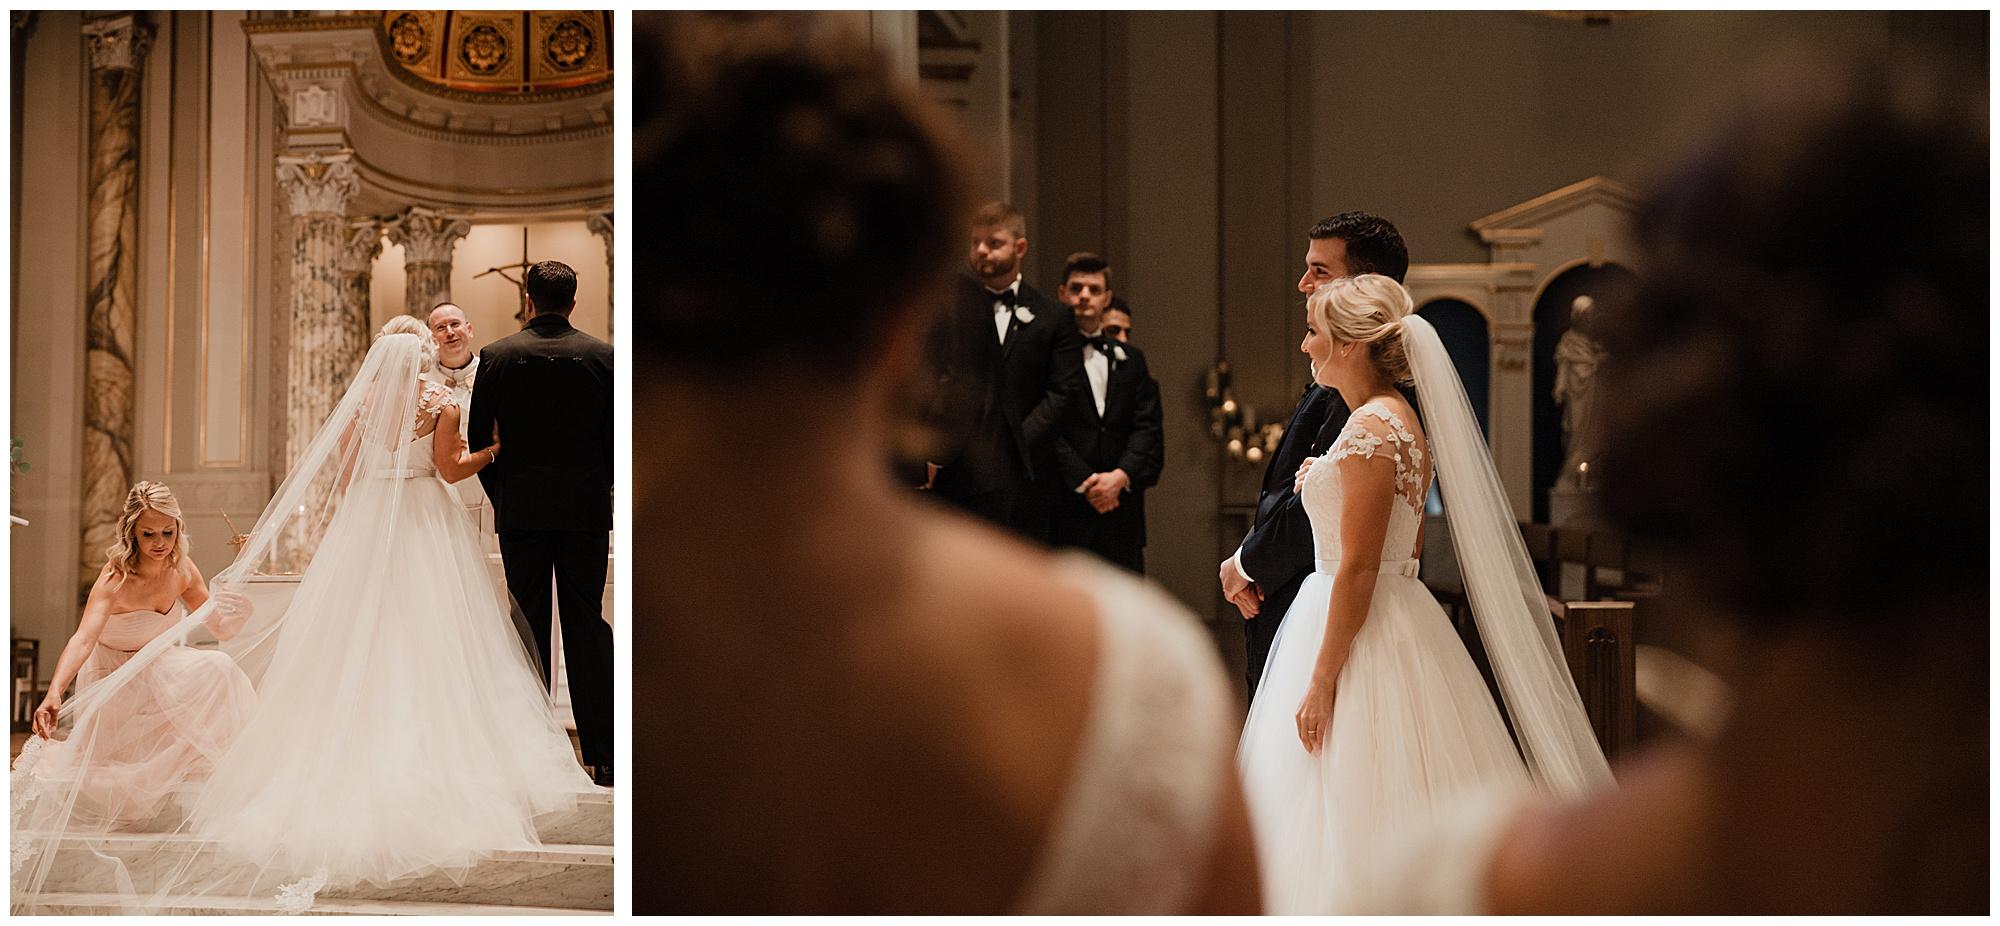 pear_tree_estate_wedding_champaign_il_wright_photographs_jj_0003.jpg